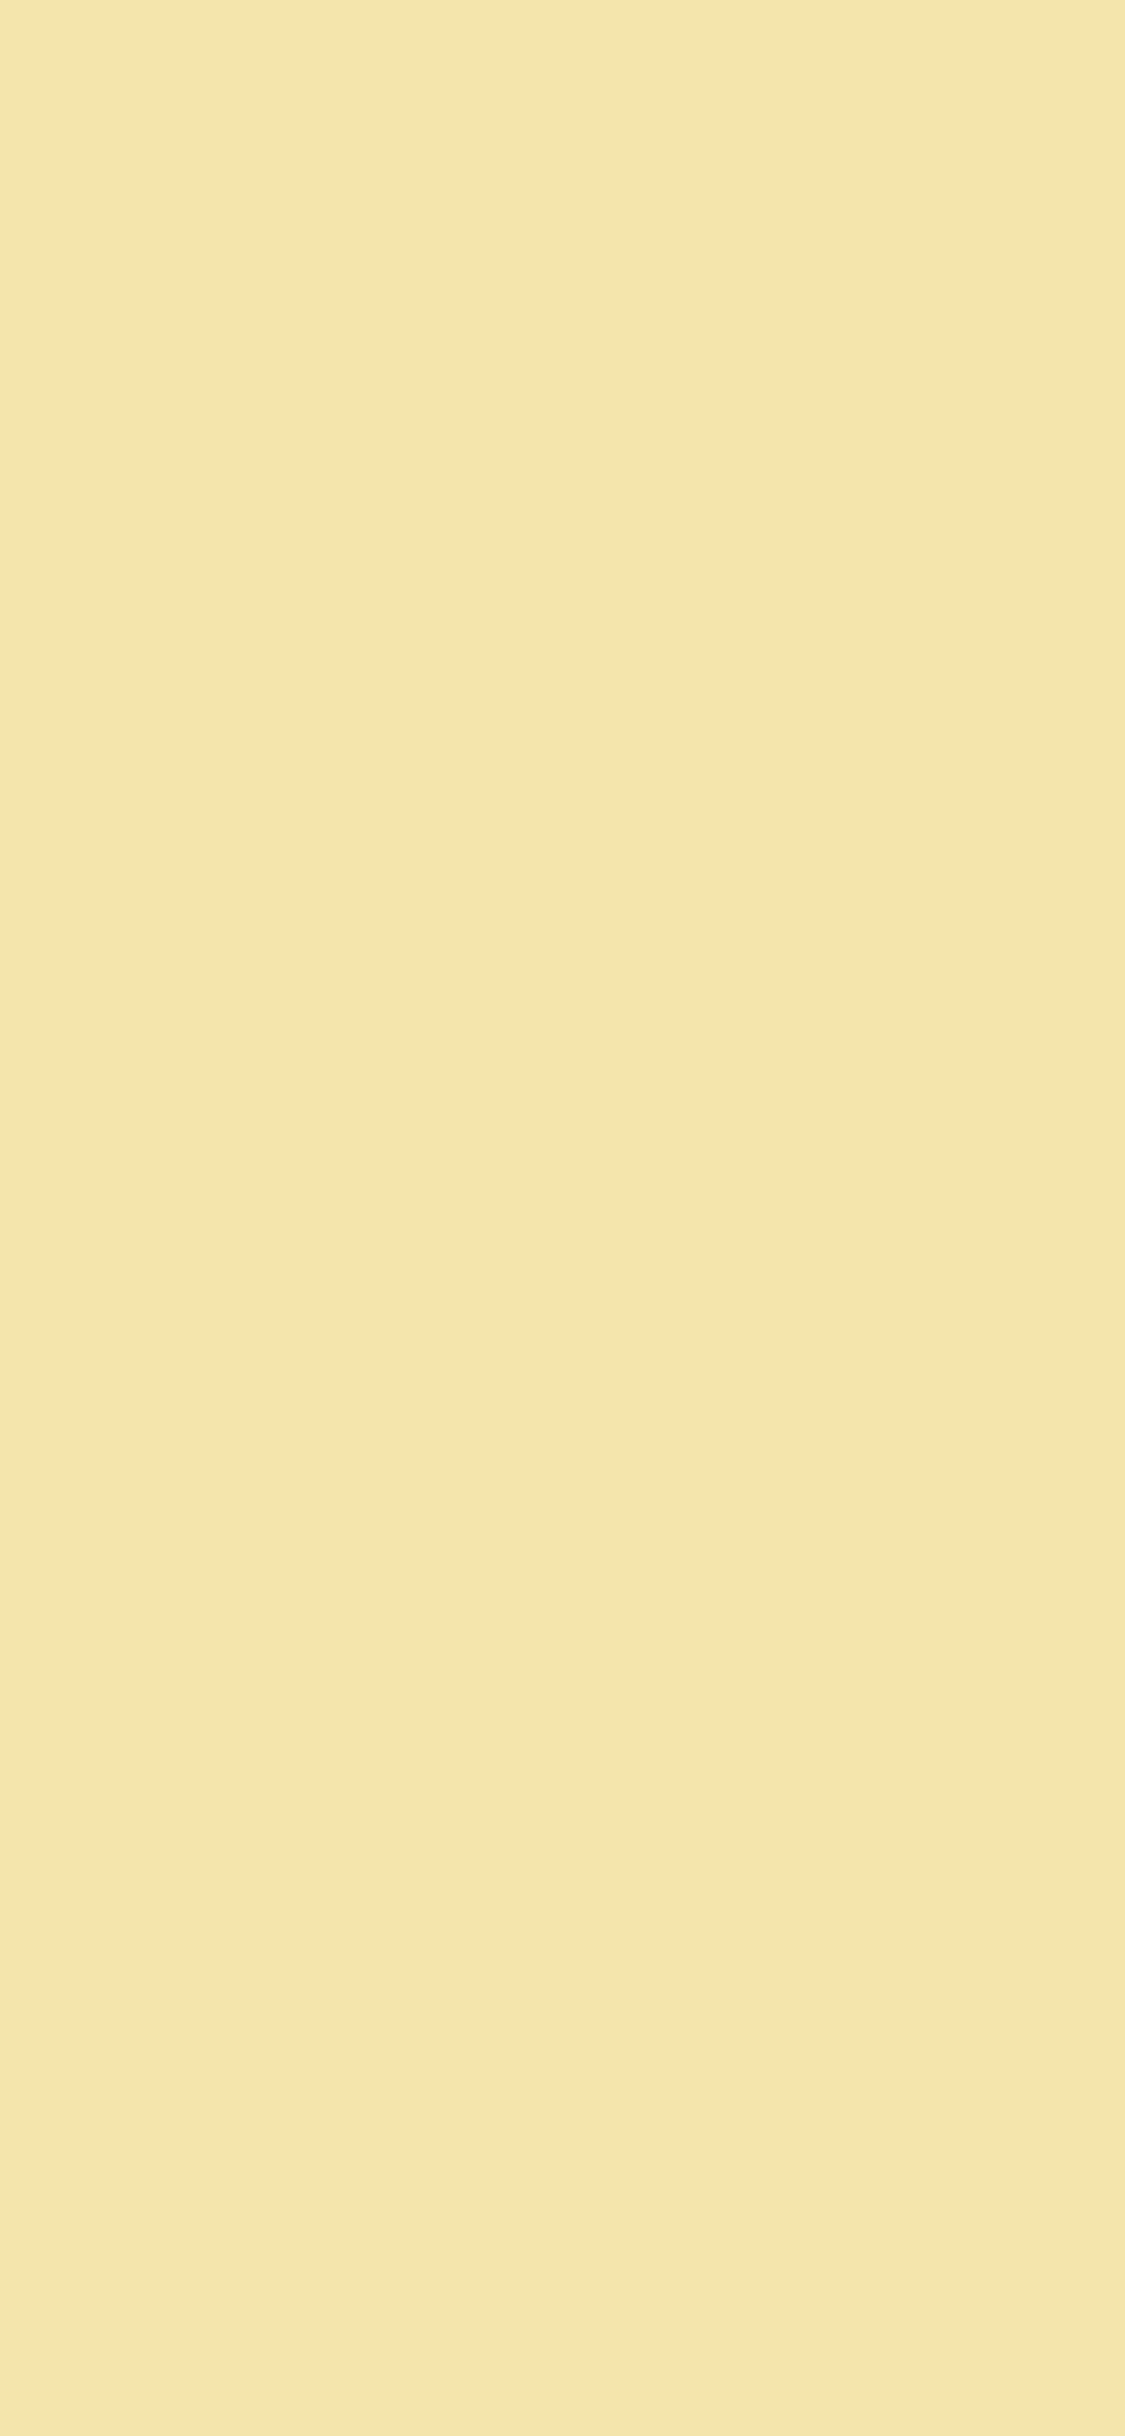 1125x2436 Vanilla Solid Color Background